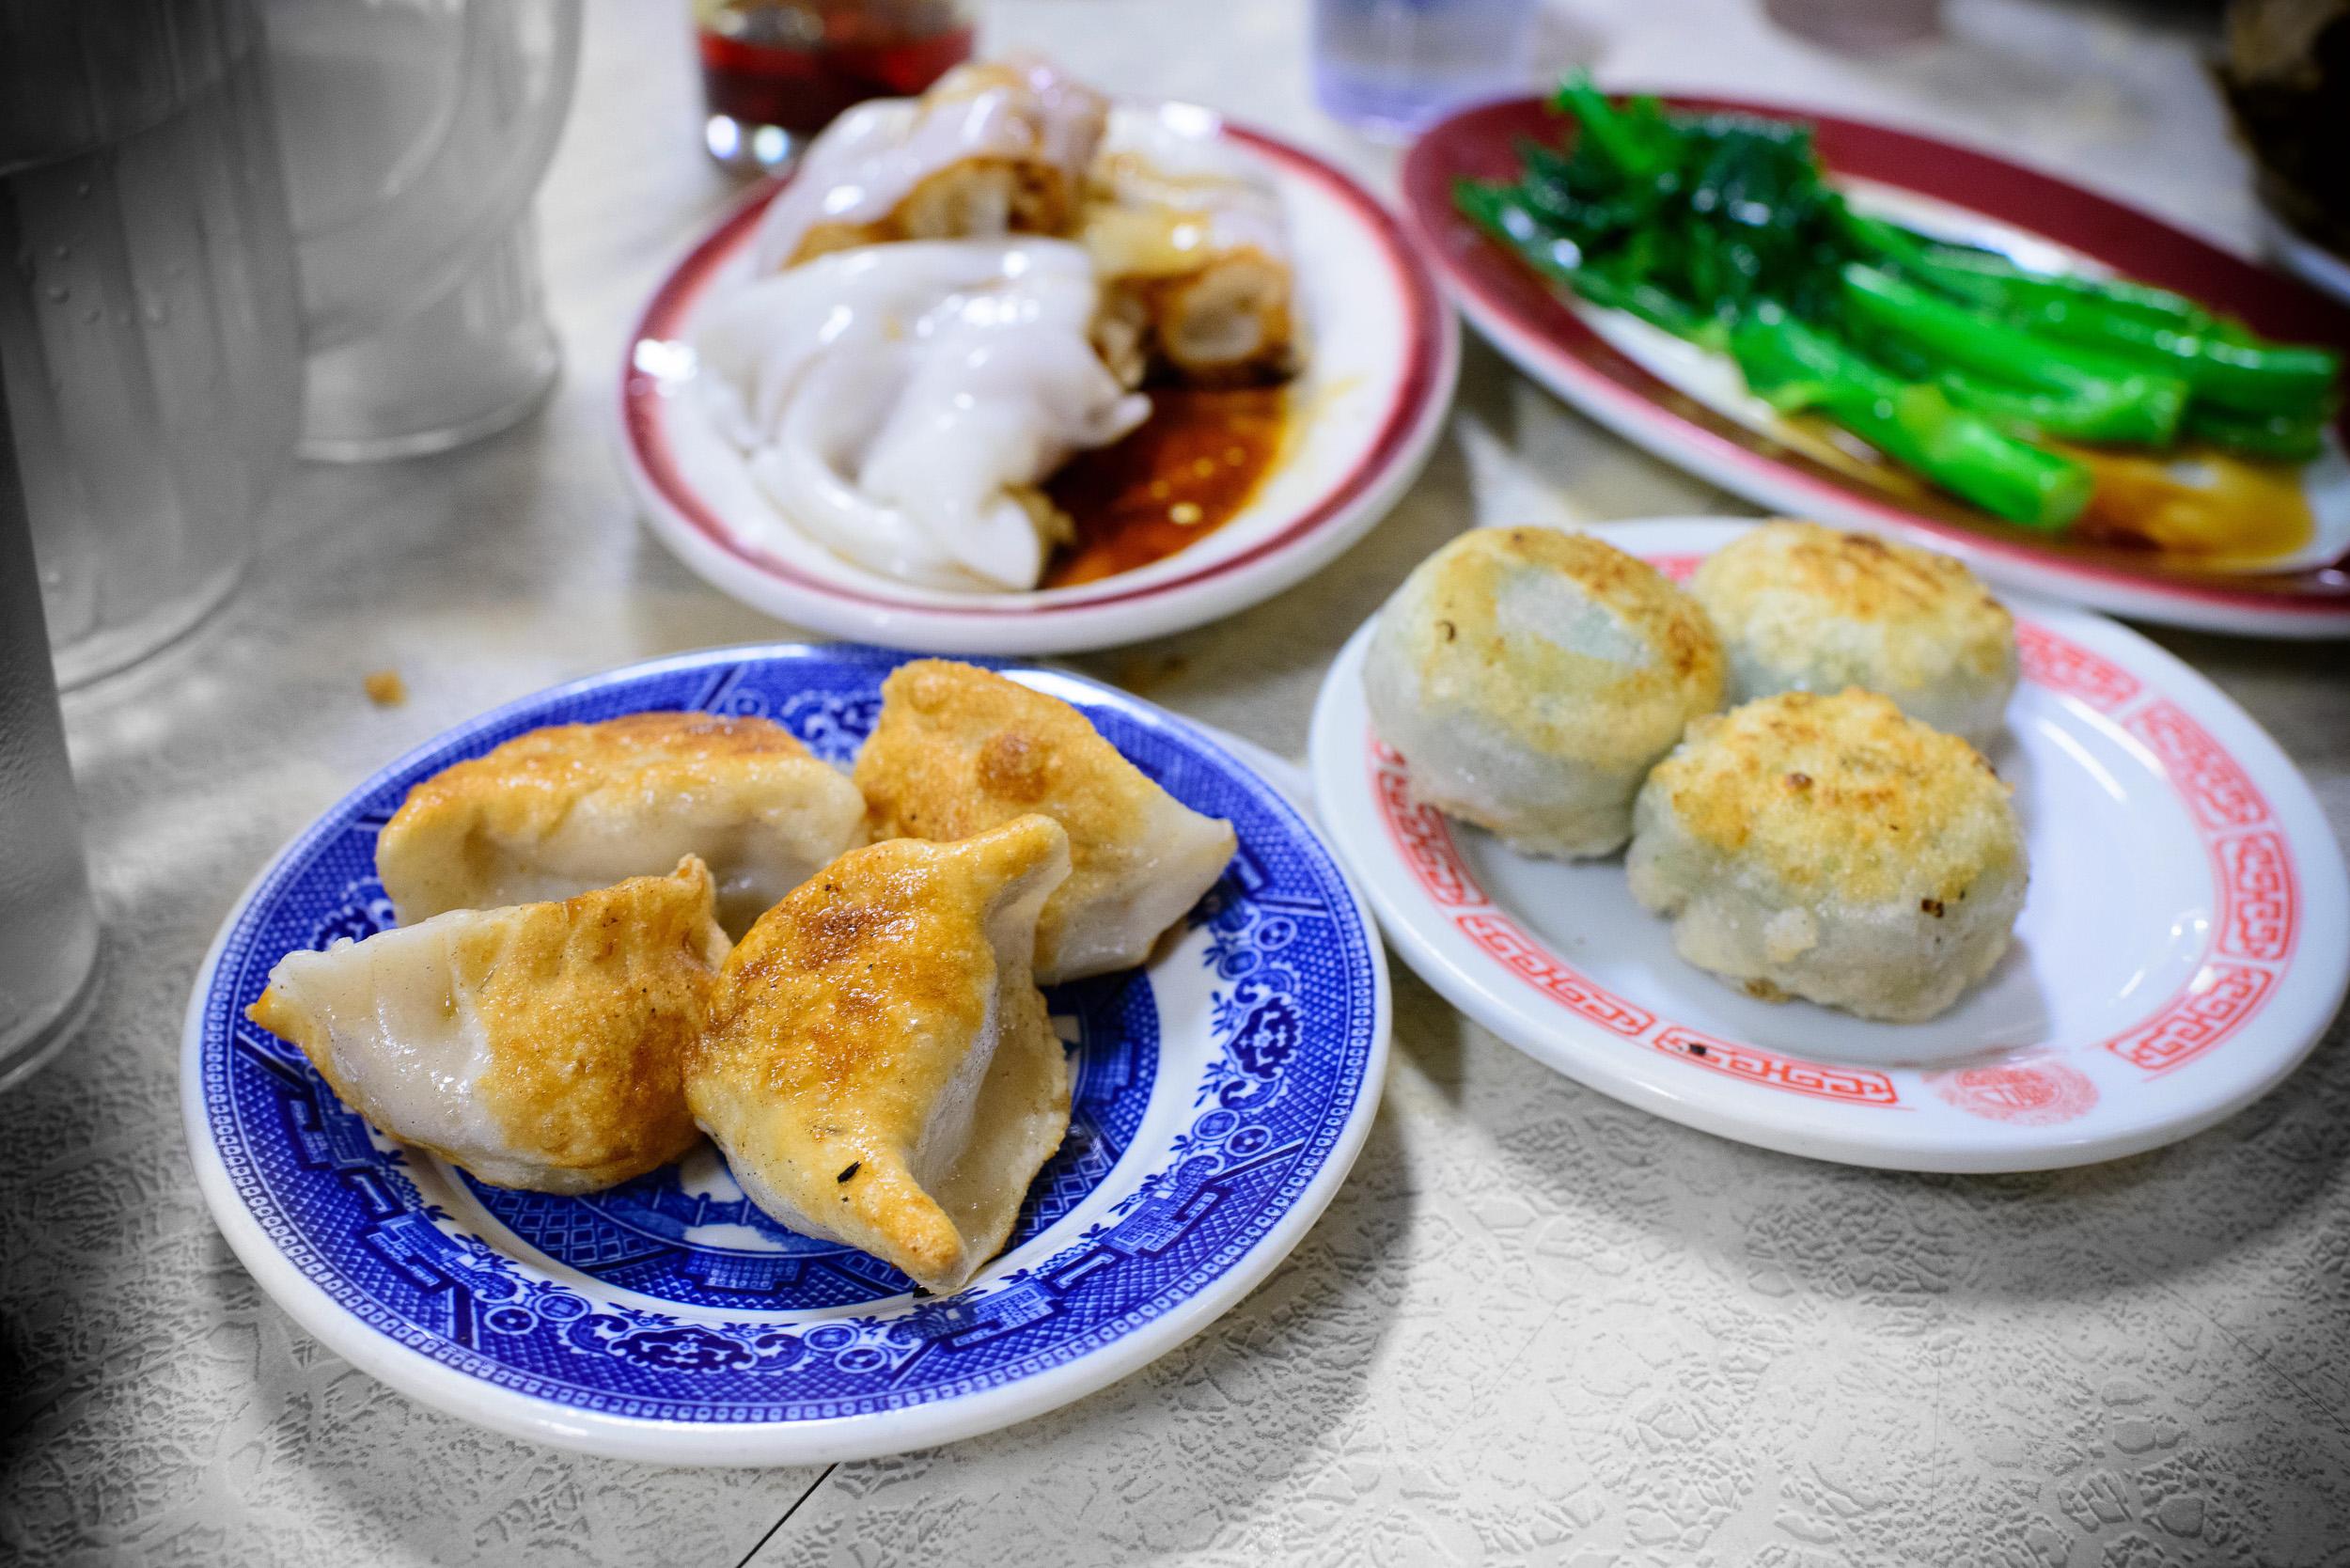 Pan fried dumplings ($3.50)